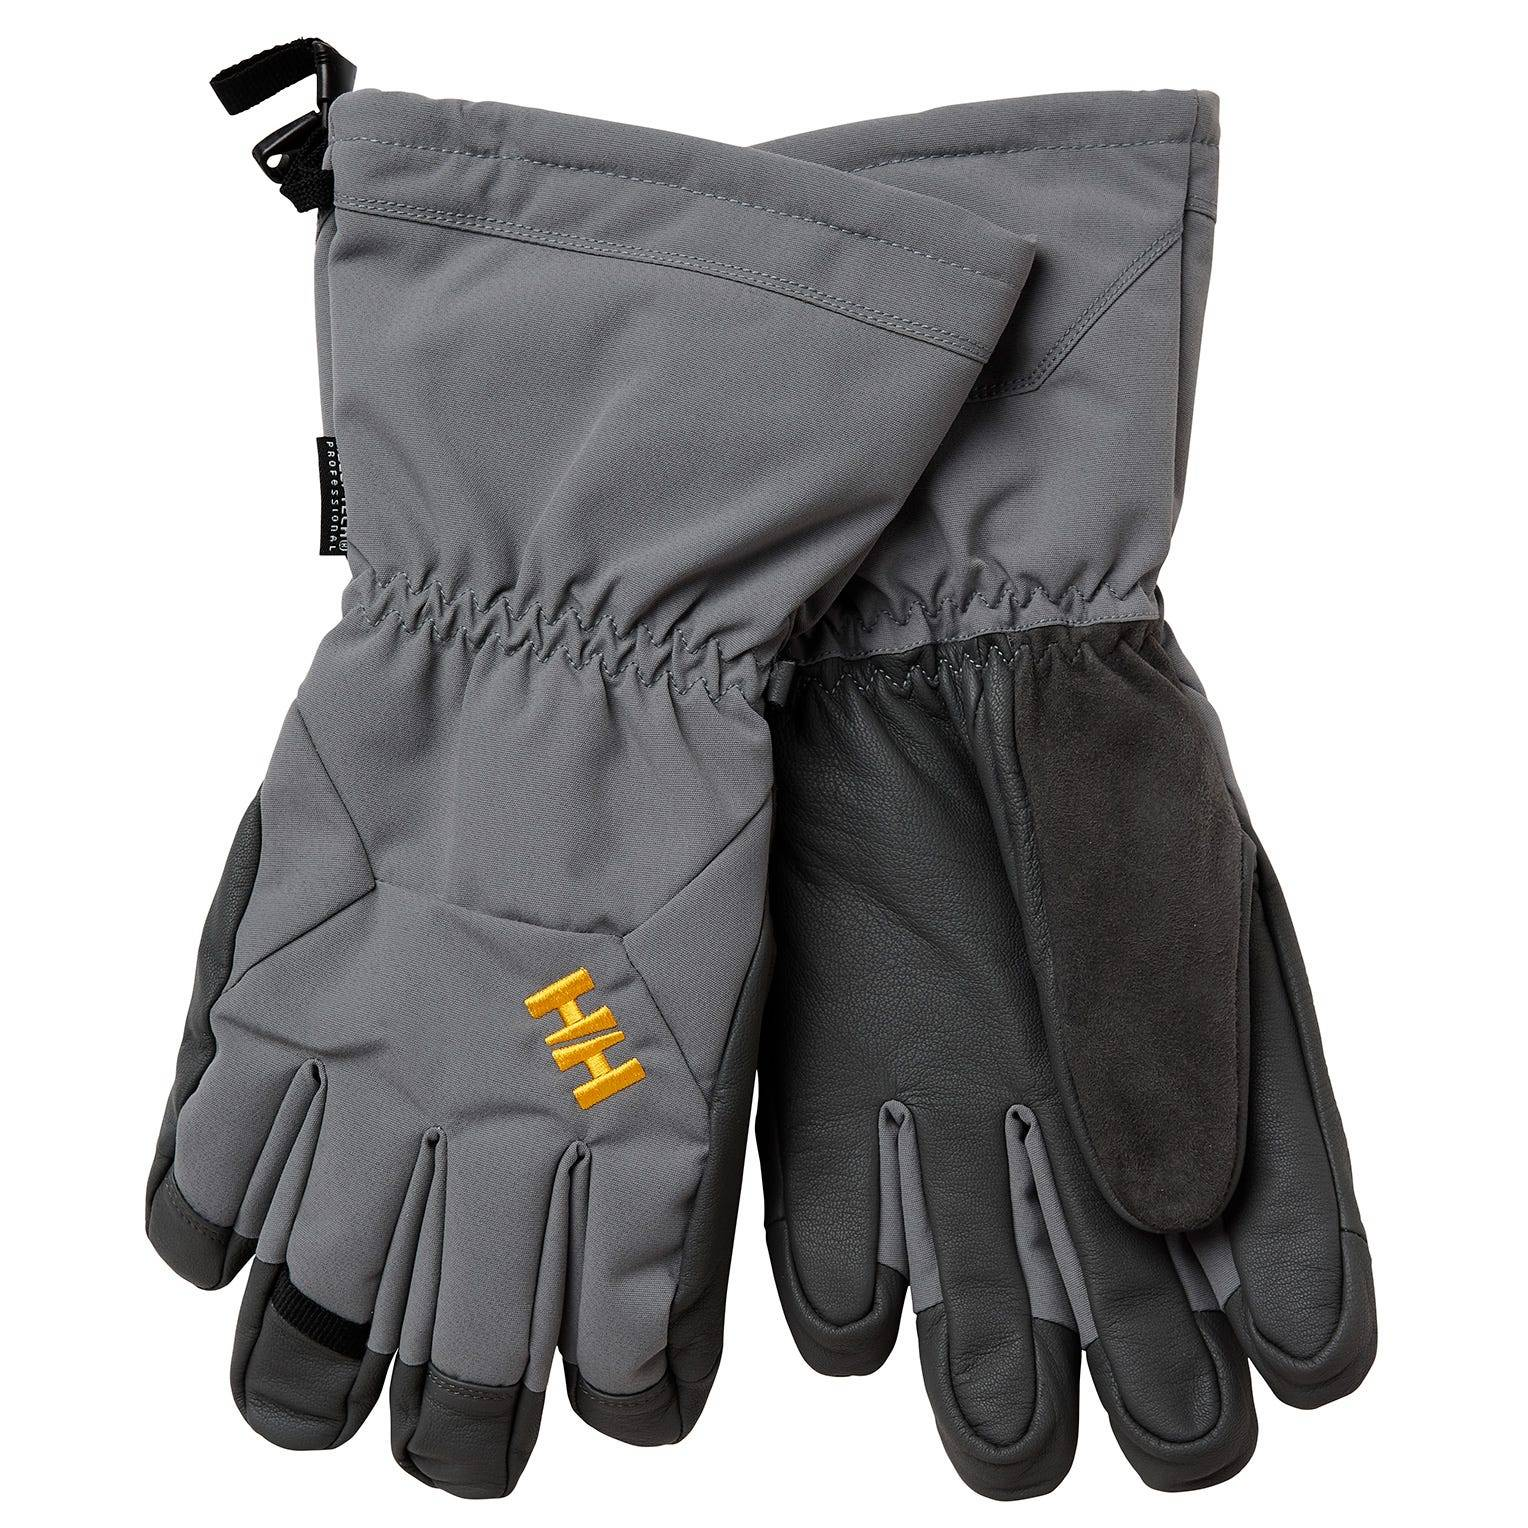 Helly Hansen Odin Gloves Mens Grey S